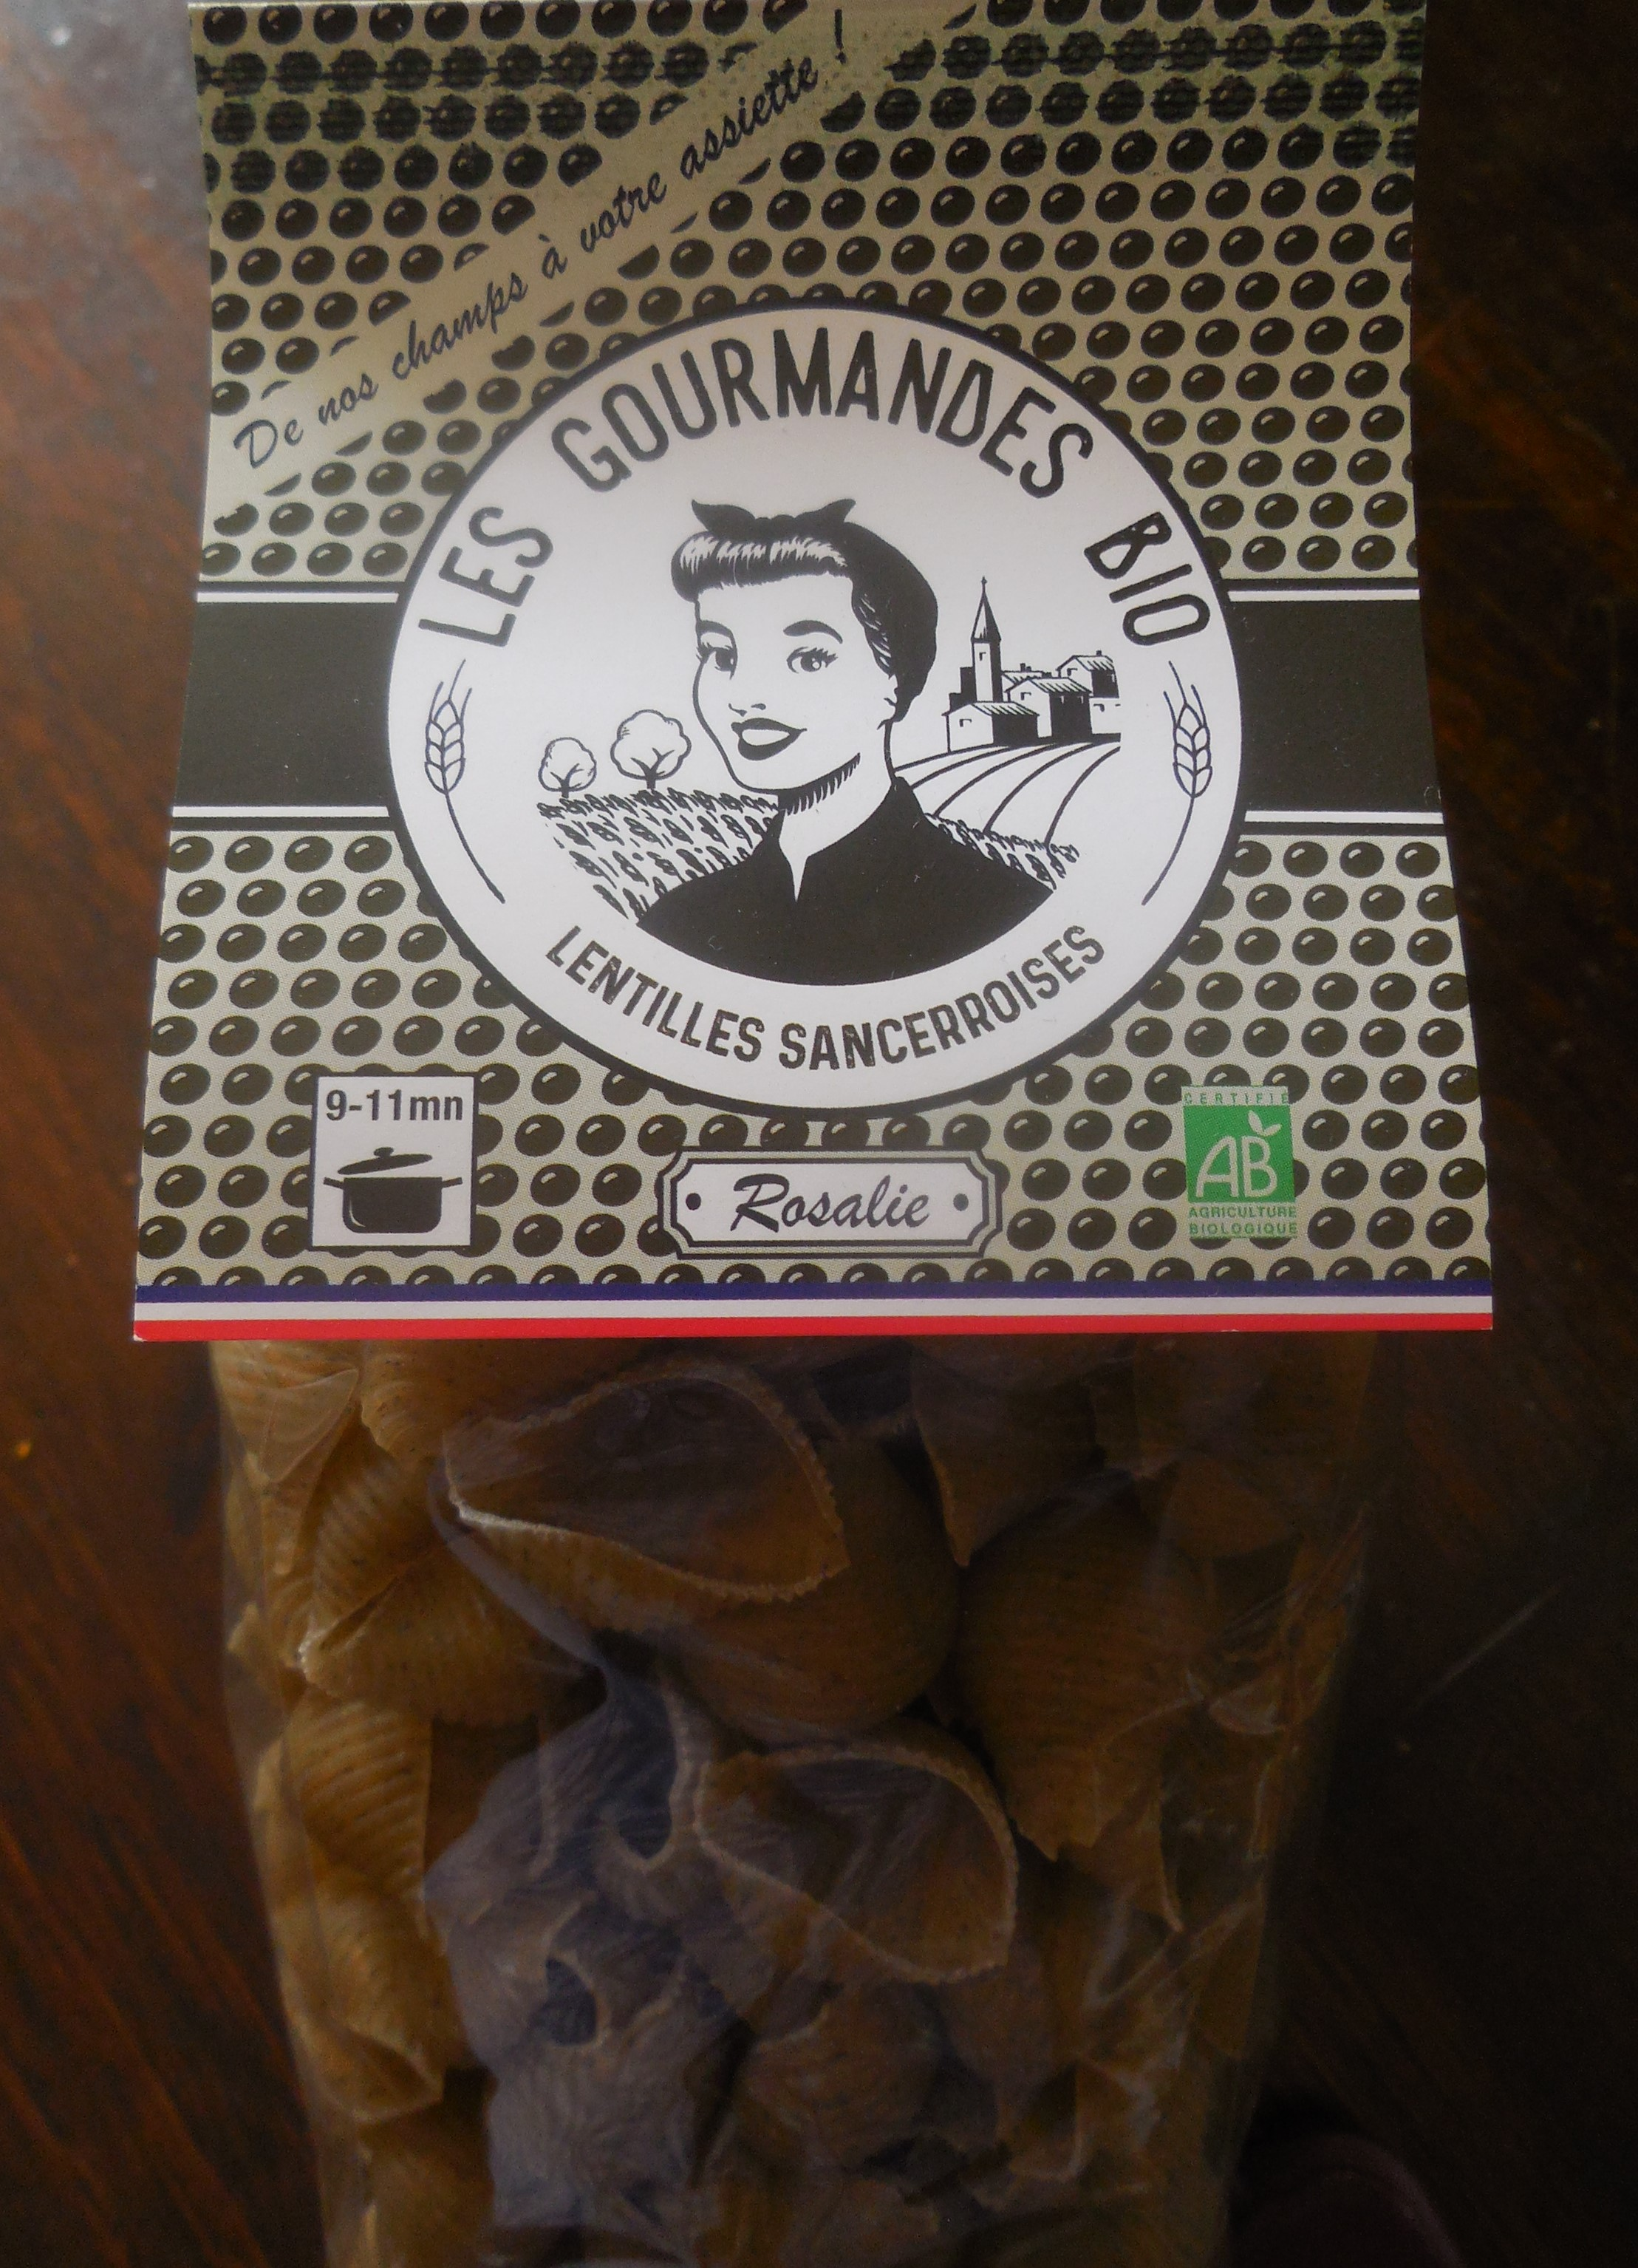 pates-gourmandesbio (1)